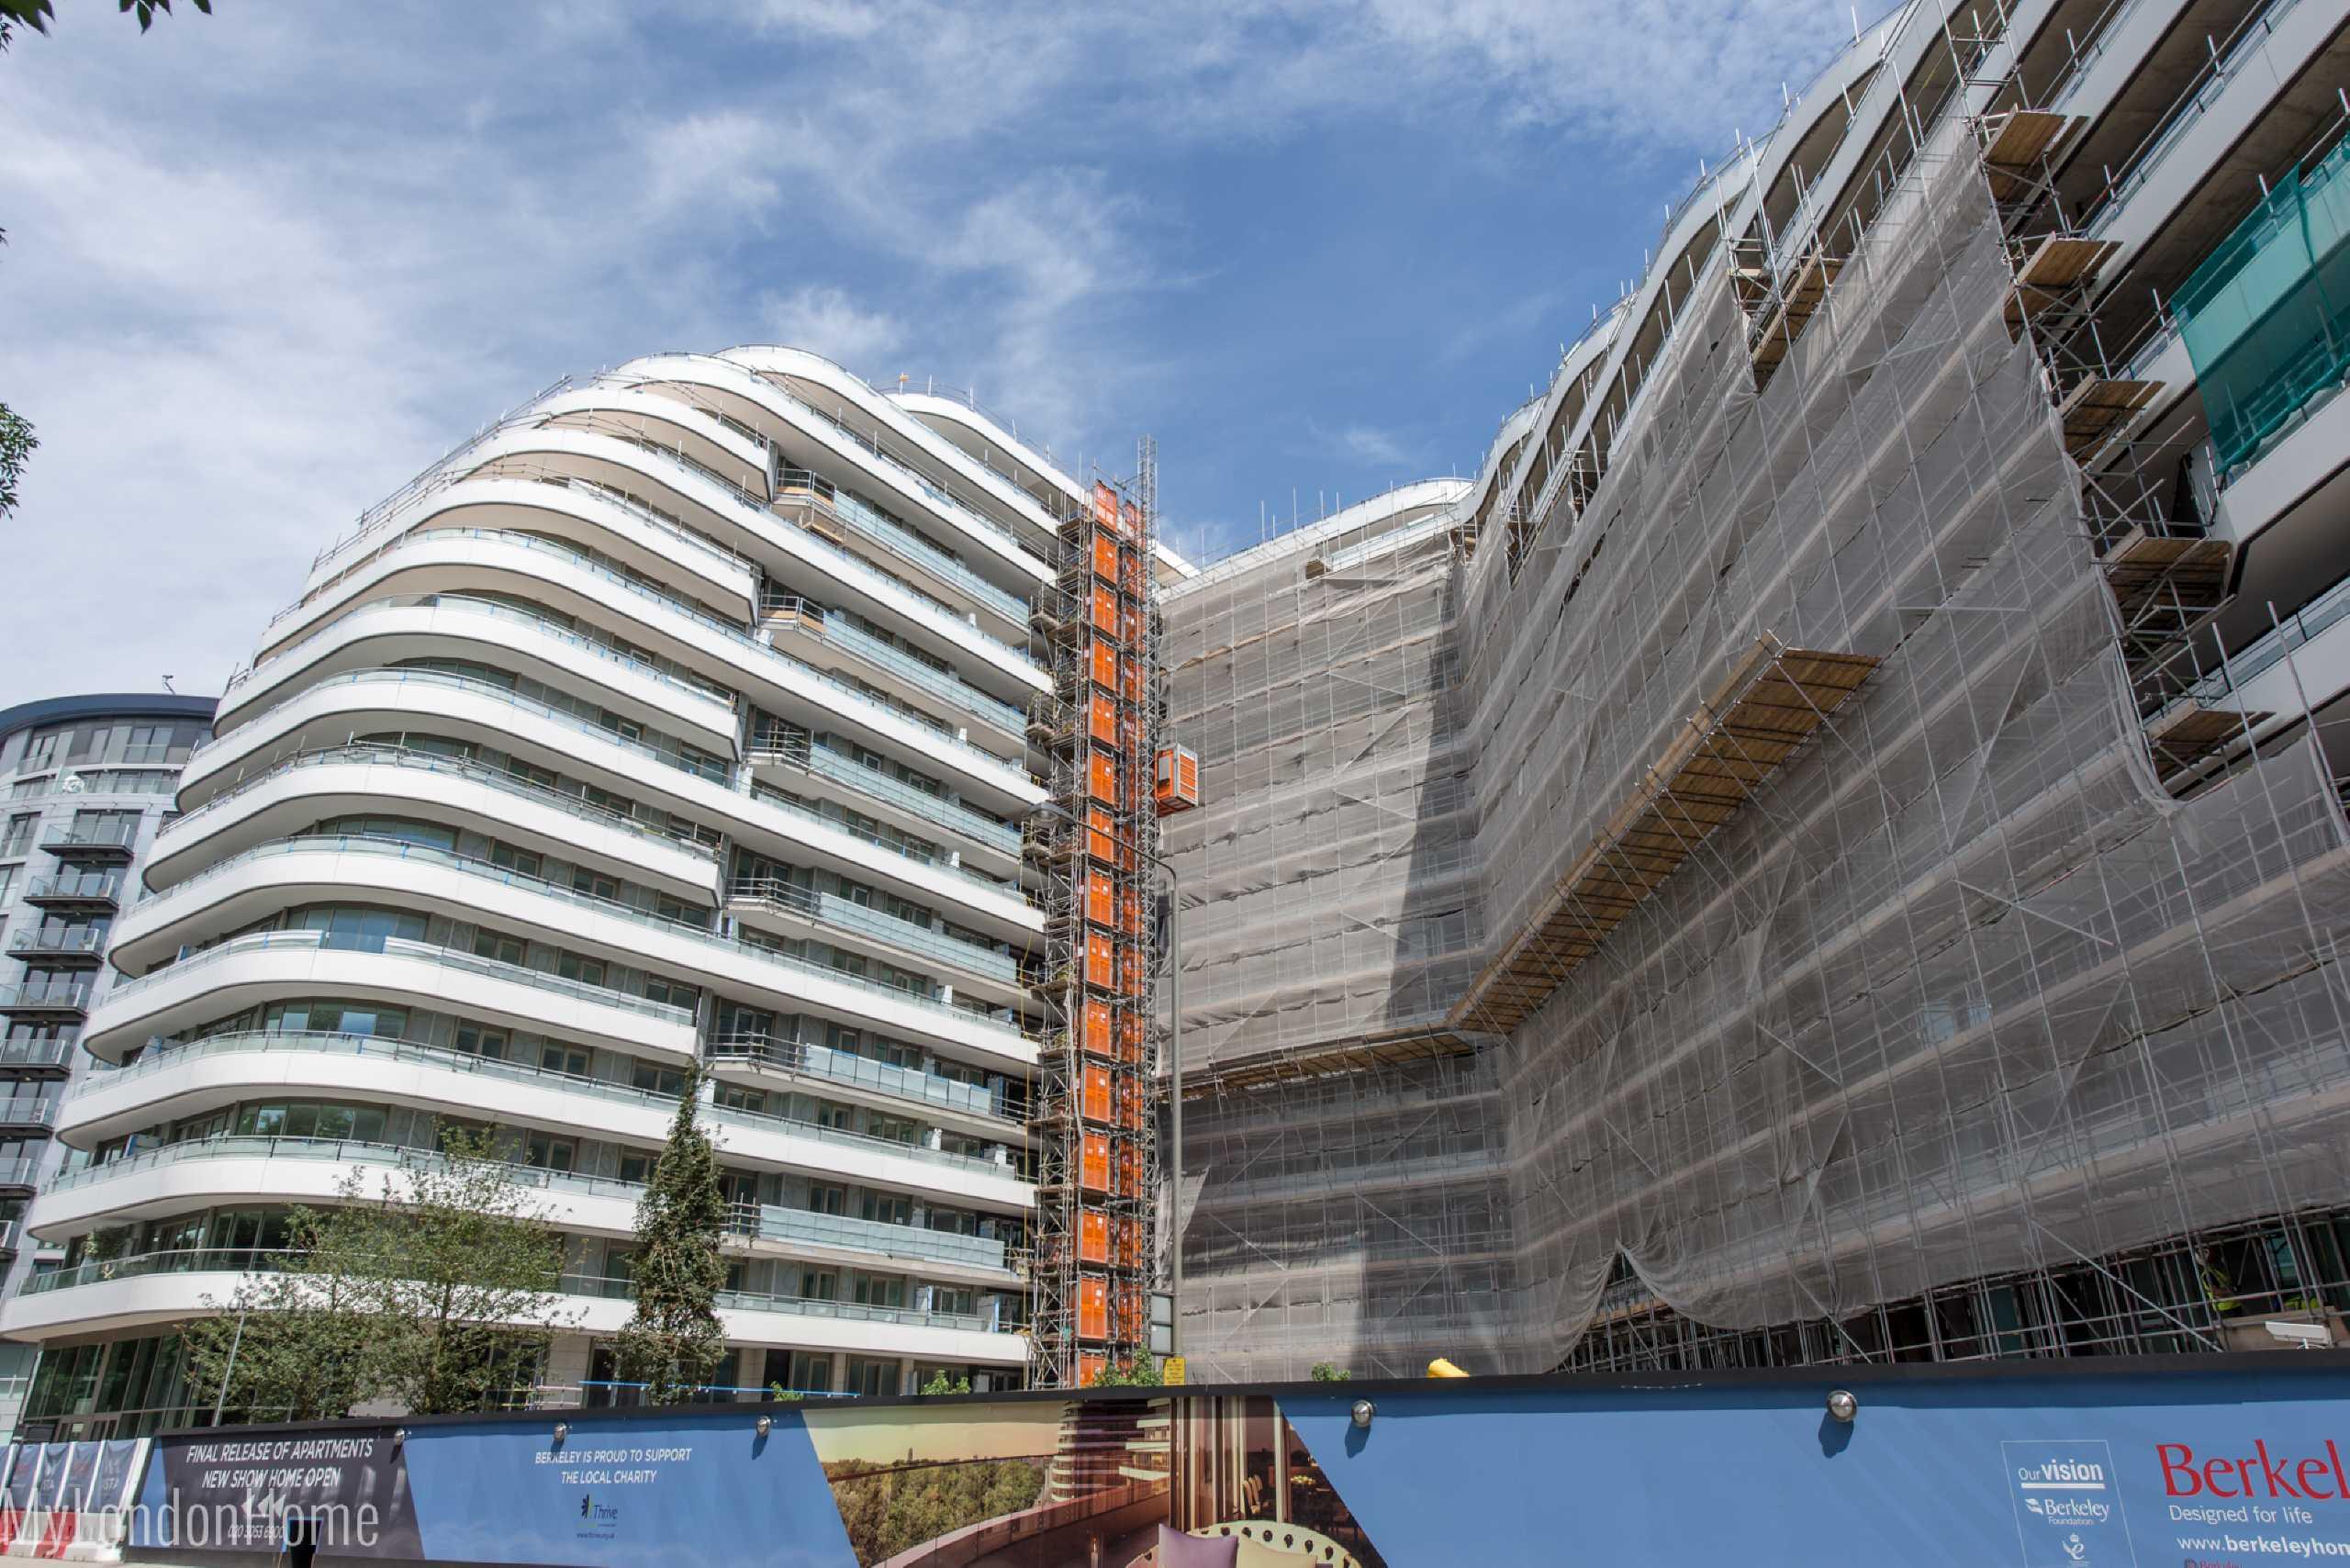 2 Bedrooms Apartment Flat for sale in Sophora House, Vista, Chelsea Bridge, Battersea, SW8